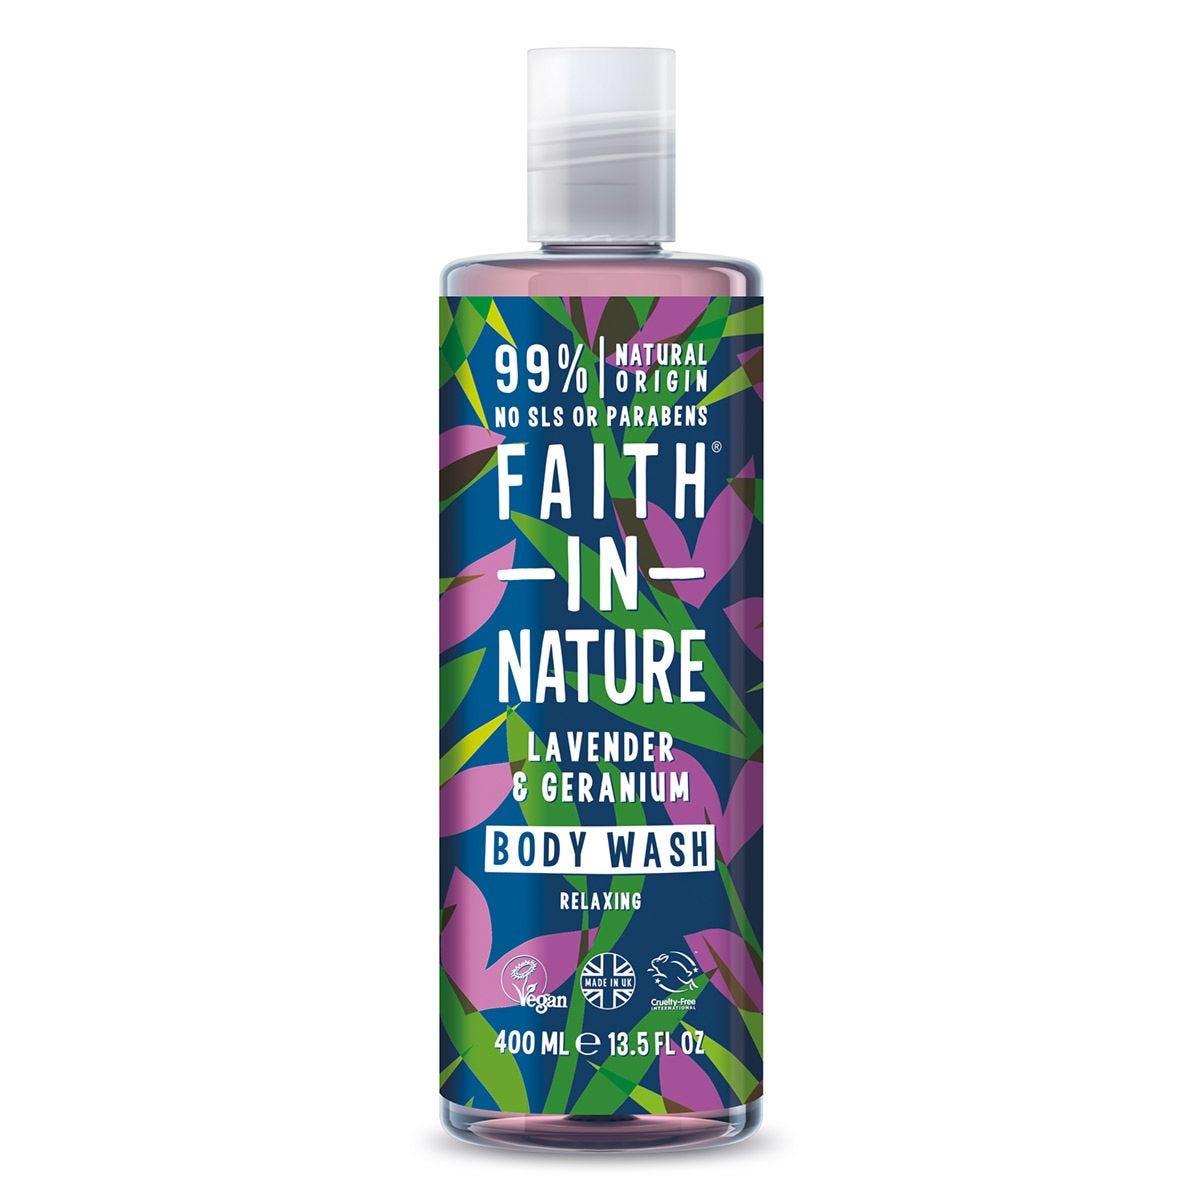 Faith In Nature Lavender Body Wash - 400ml